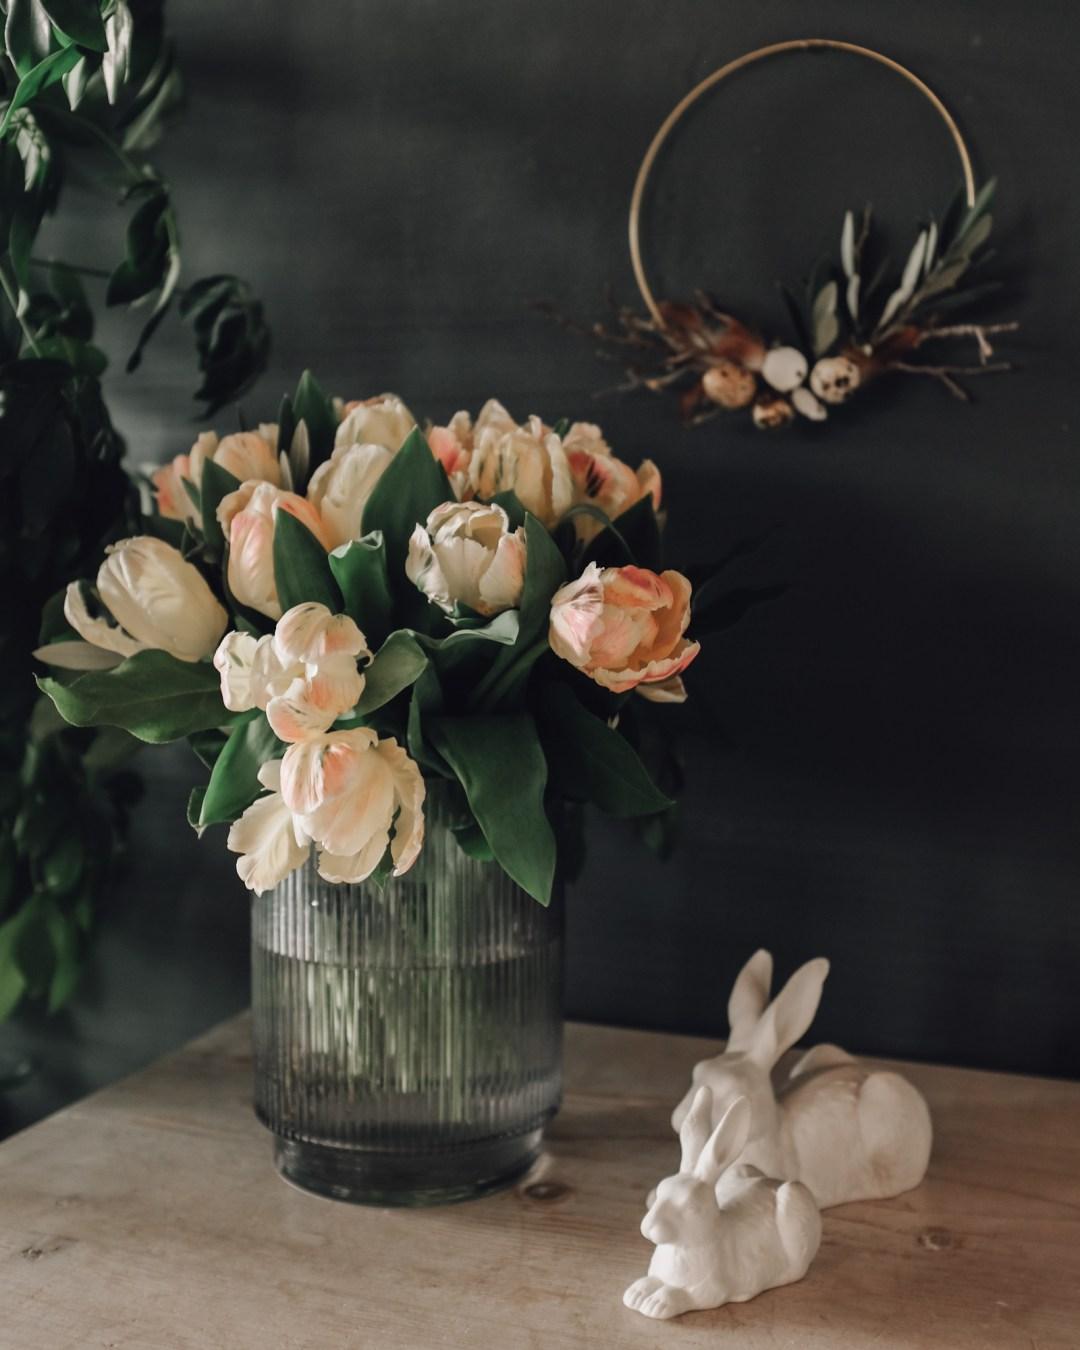 Inastil, Frühling2020, Tulpen, Ostrrdekoration, Osterkranz, Dekorationsideen Frühling, Tulpenstrauß, Homestyling, Frühlingsdeko-2